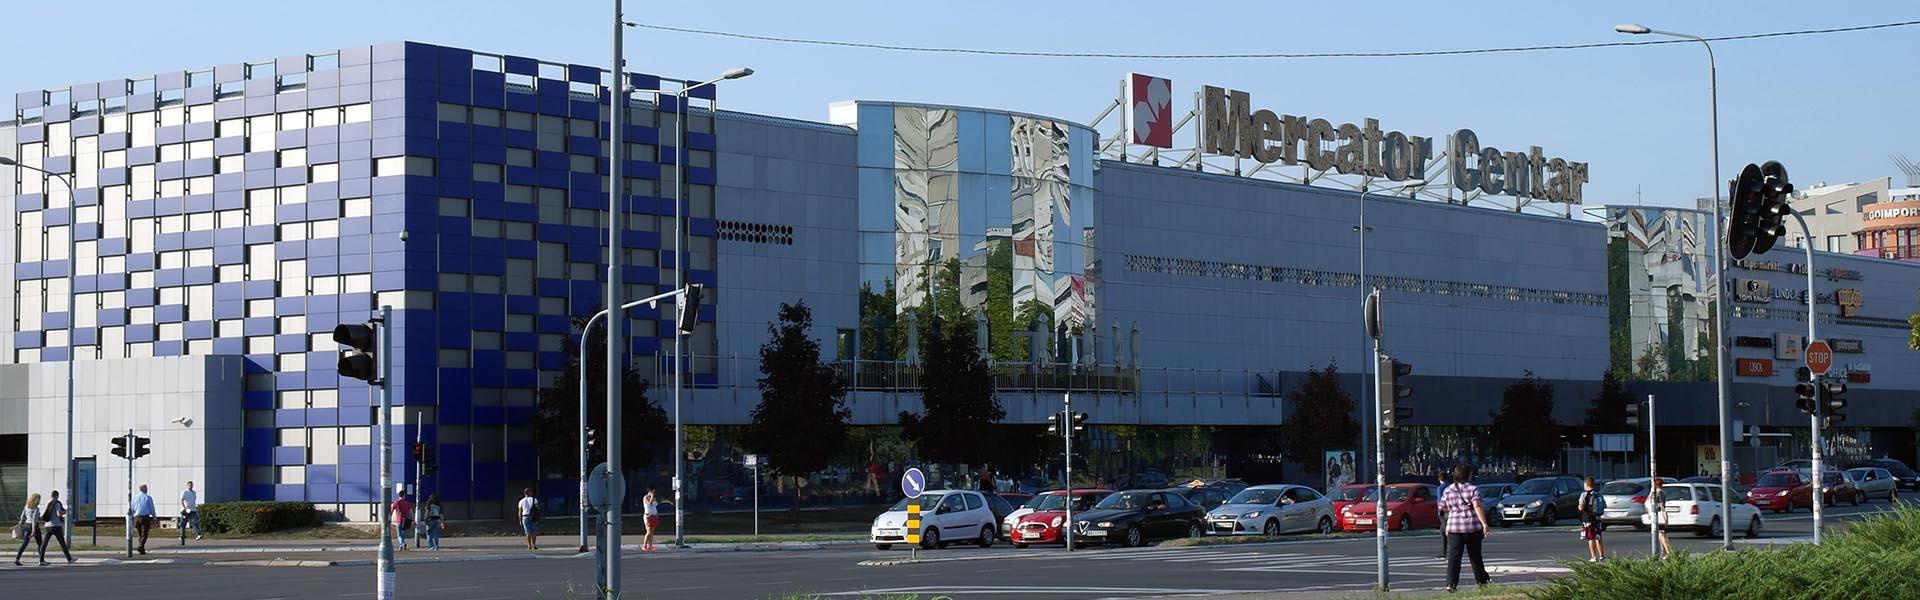 Dostava hrane novi Merkator (blok 29, 30, 31, 32, 33) | Beograd